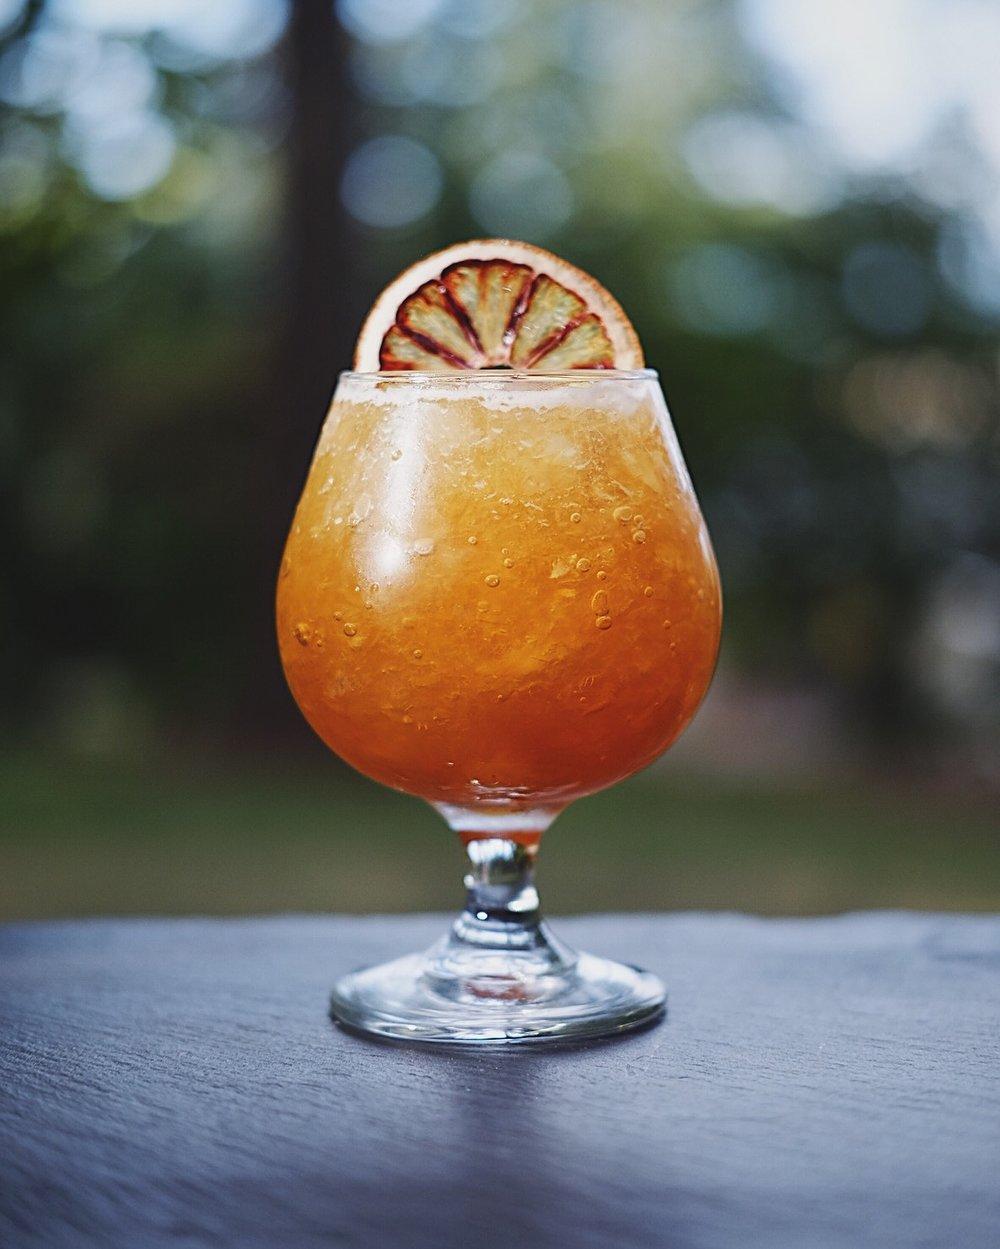 ingredients: - 1 oz blackstrap rum1/2 oz blended rum (i used Eclipse, because duh)3/4 oz Kashmiri Amaro3/4 oz fresh lemon juice1/2 oz Falernum1/2 oz Demerara syrup3 dashes barrel aged bittersGarnish: dehydrated blood orange wheel